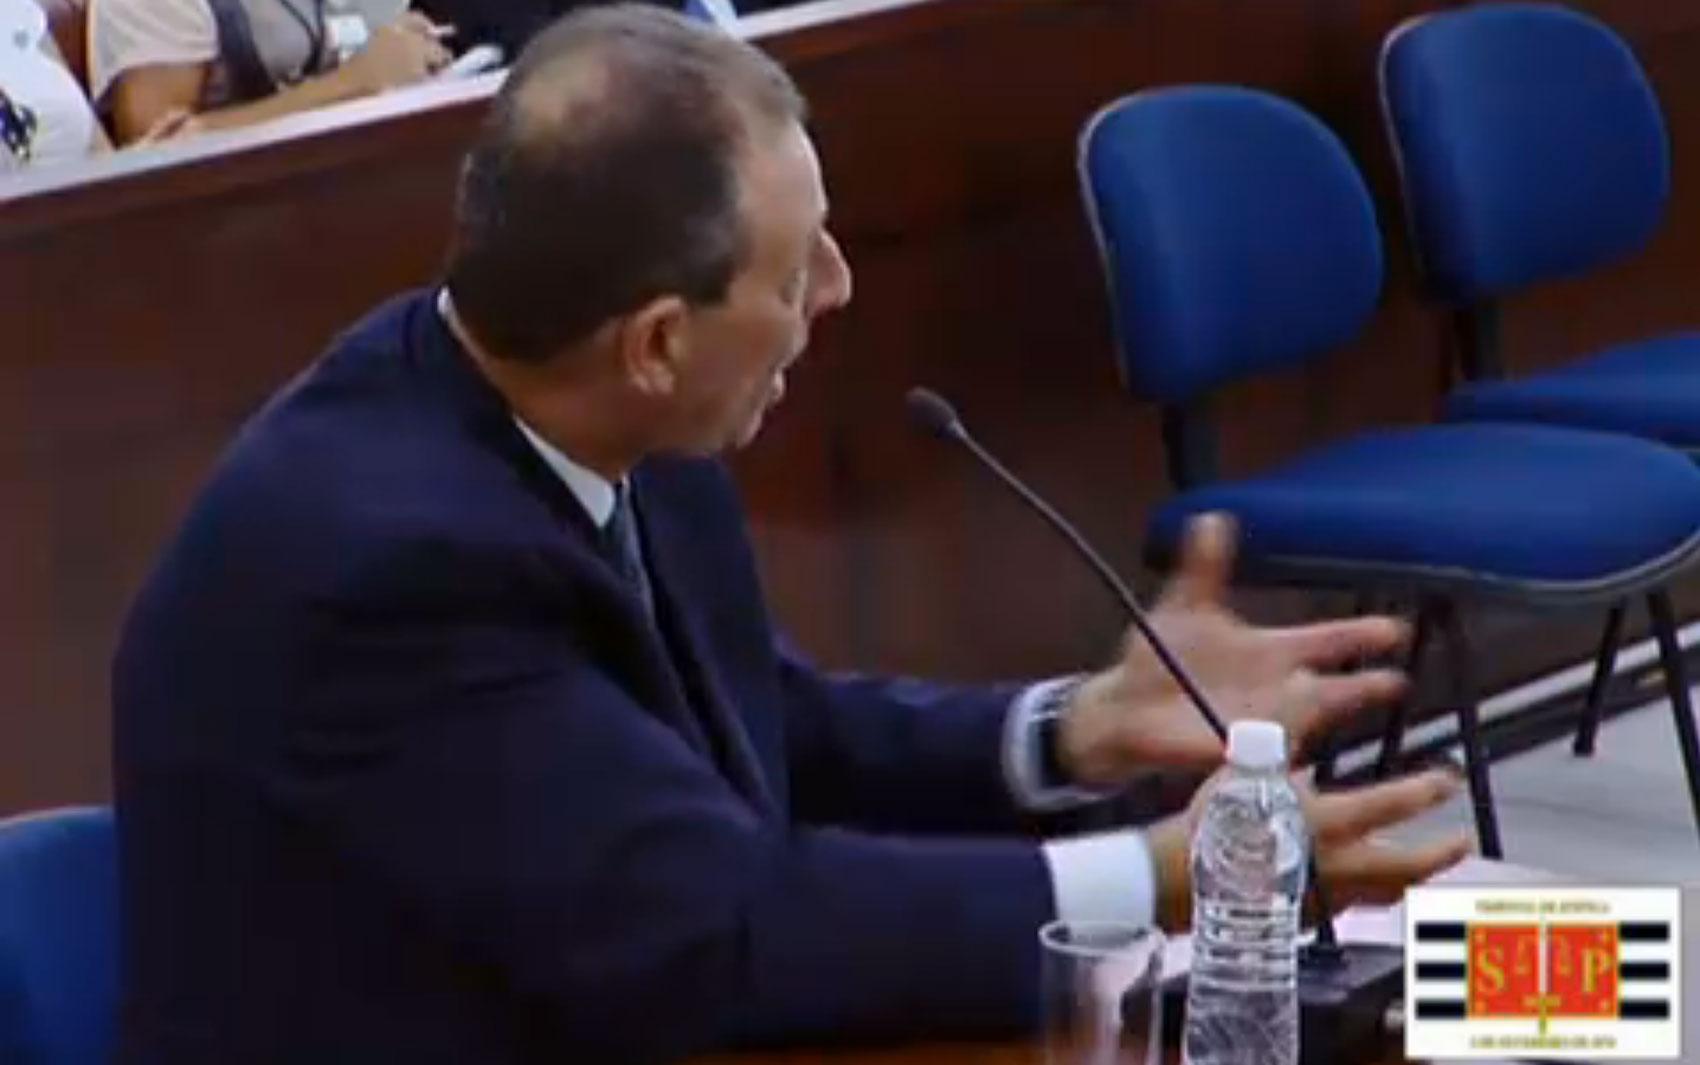 13/03/2013 - O perito Renato Pattoli, que coordenou a emissão de laudos e exames do caso, responde a perguntas do advogado Samir Haddad Jr., representante de Mizael